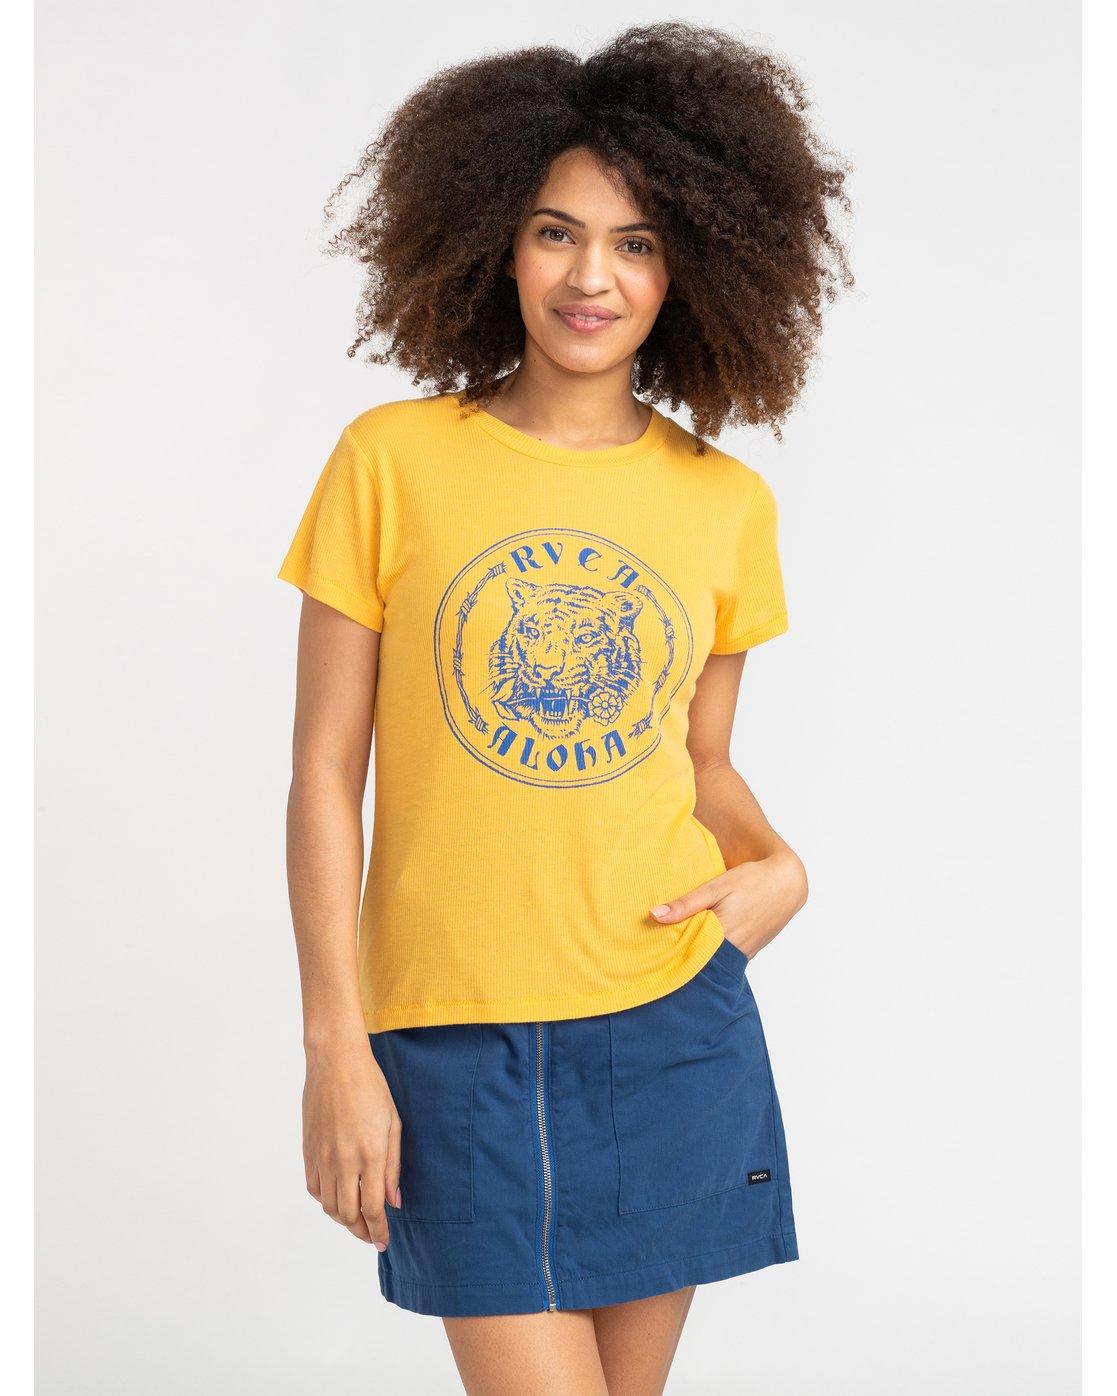 0 Benjamin Jeanjean Alohatiger - T-Shirt for T-Shirt Yellow S3SSRIRVP0 RVCA